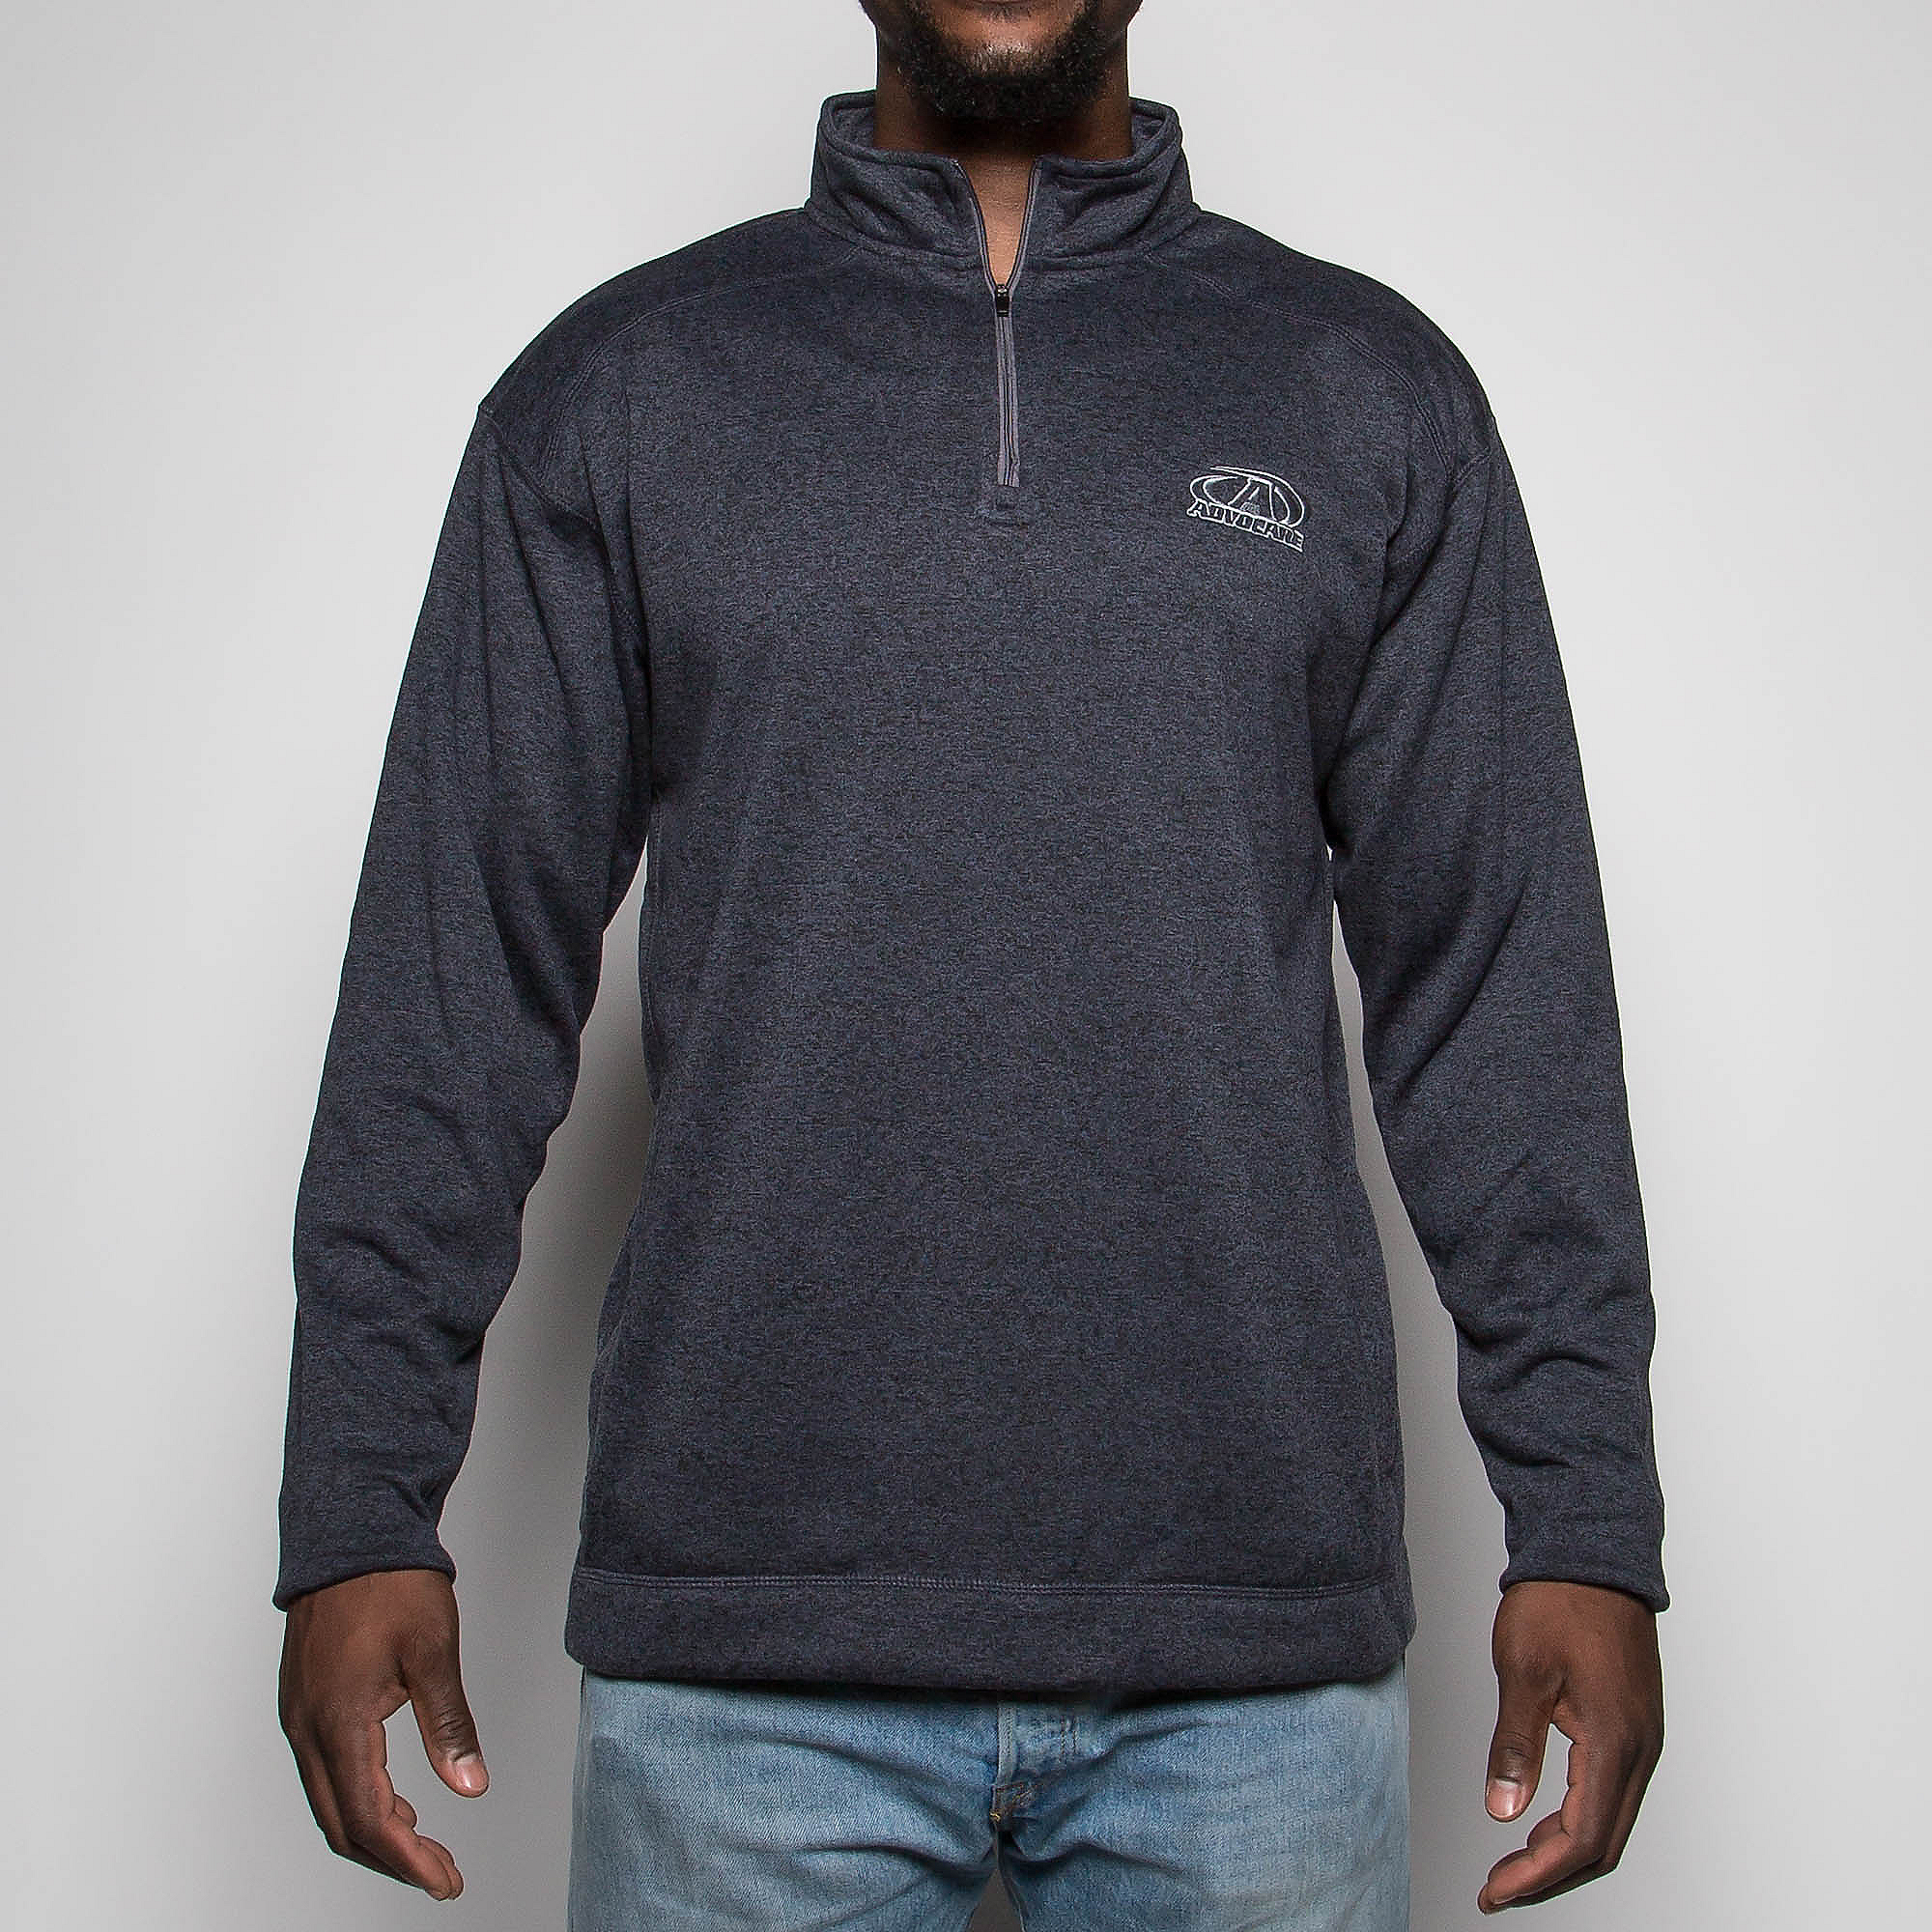 AdvoCare Mens Quarter Zip Pullover